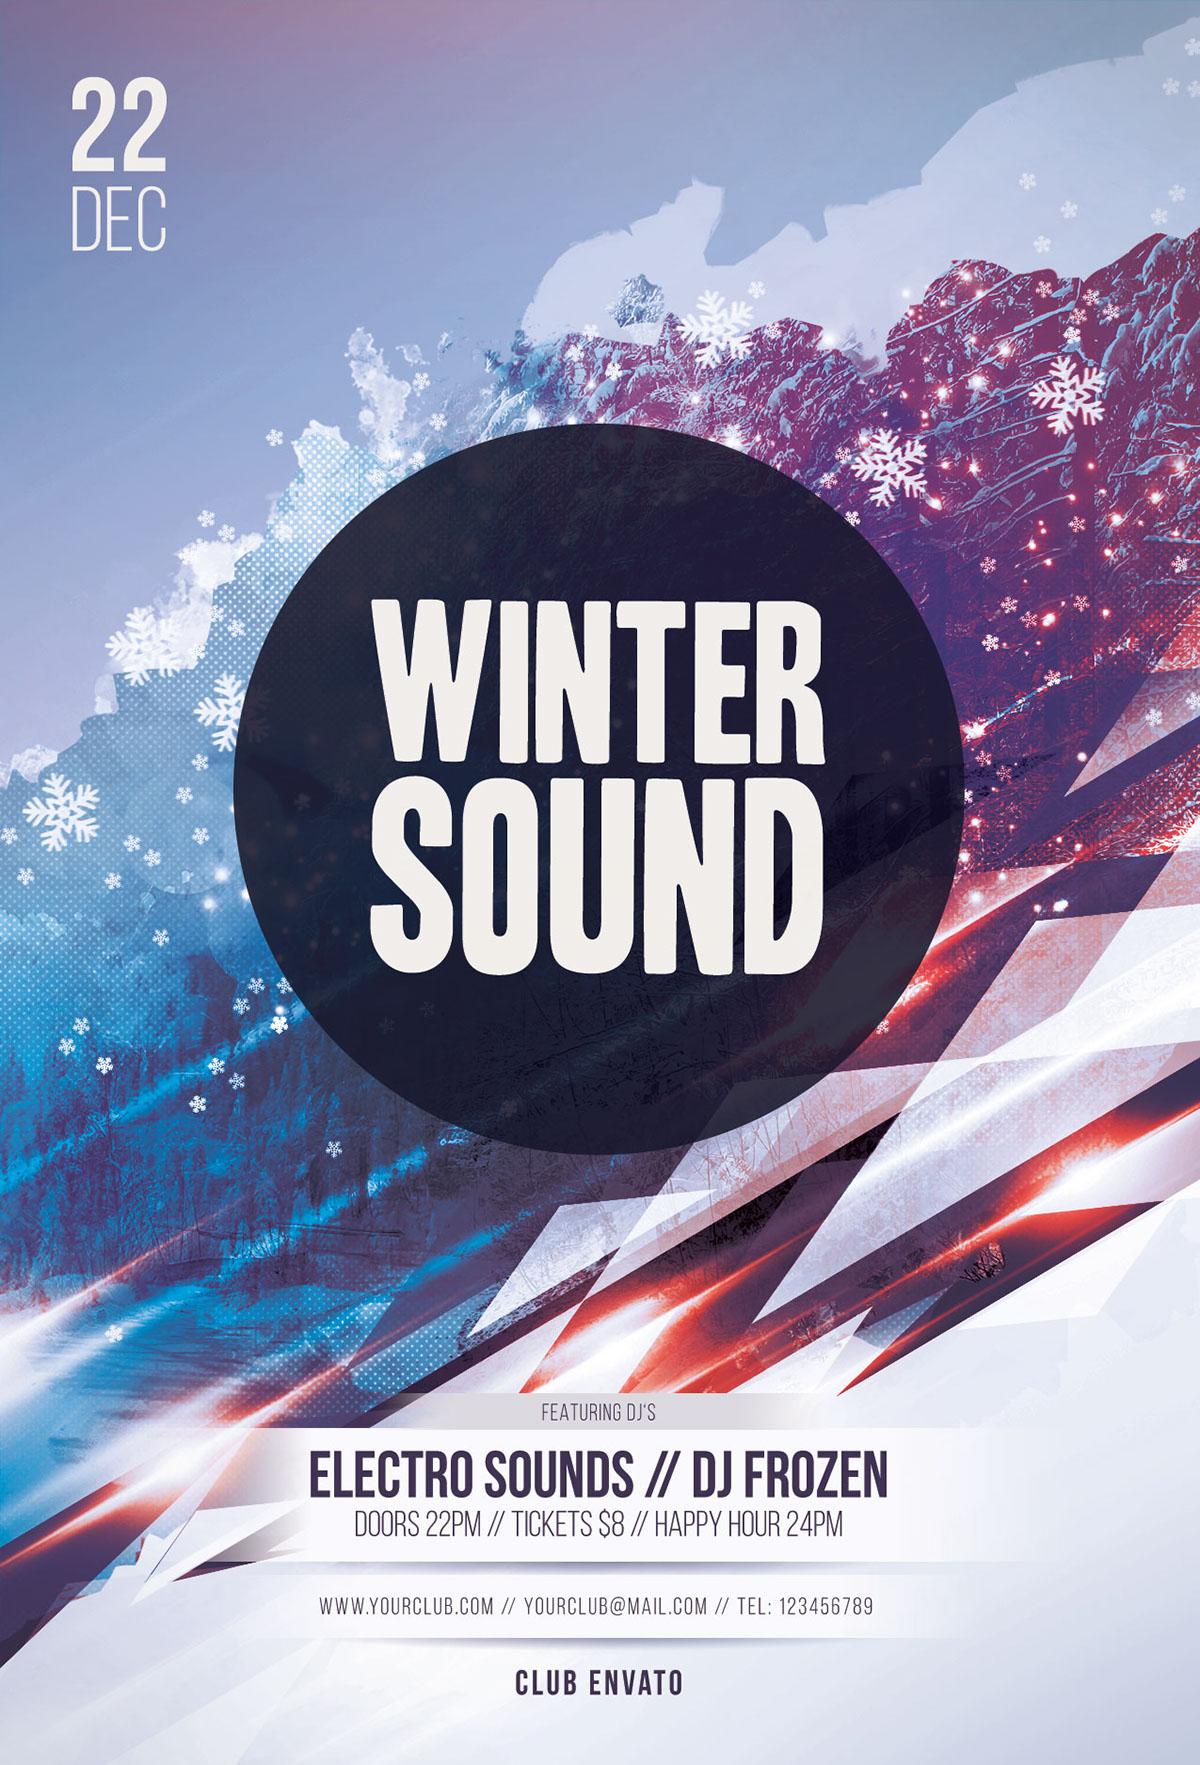 Winter Sound Flyer Template On Behance